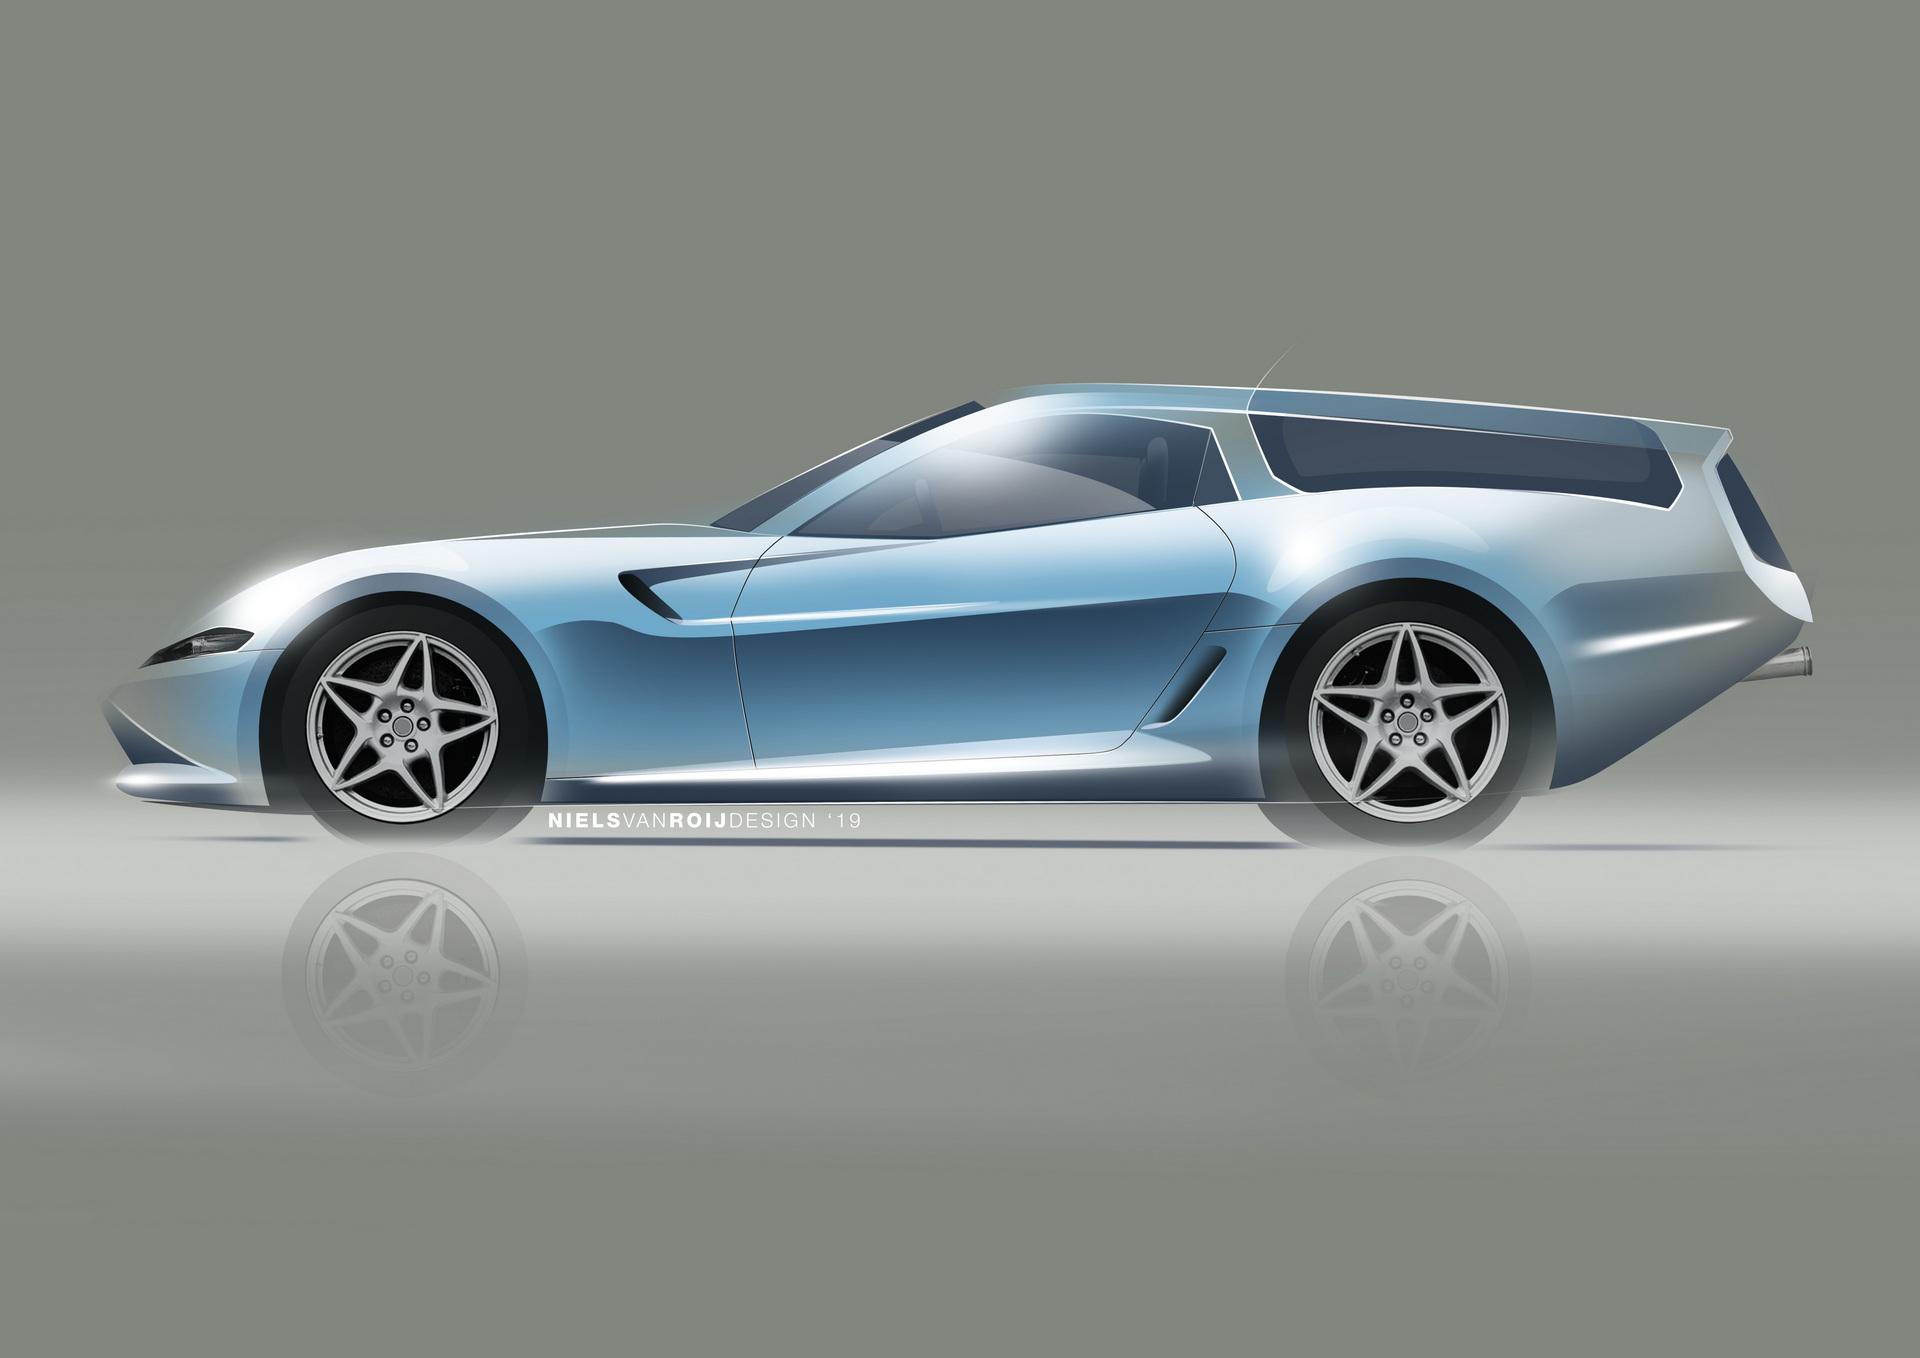 Ferrari-Daytona-Shooting-Brake-Hommage-by-Niels-van-Roij-Design-16